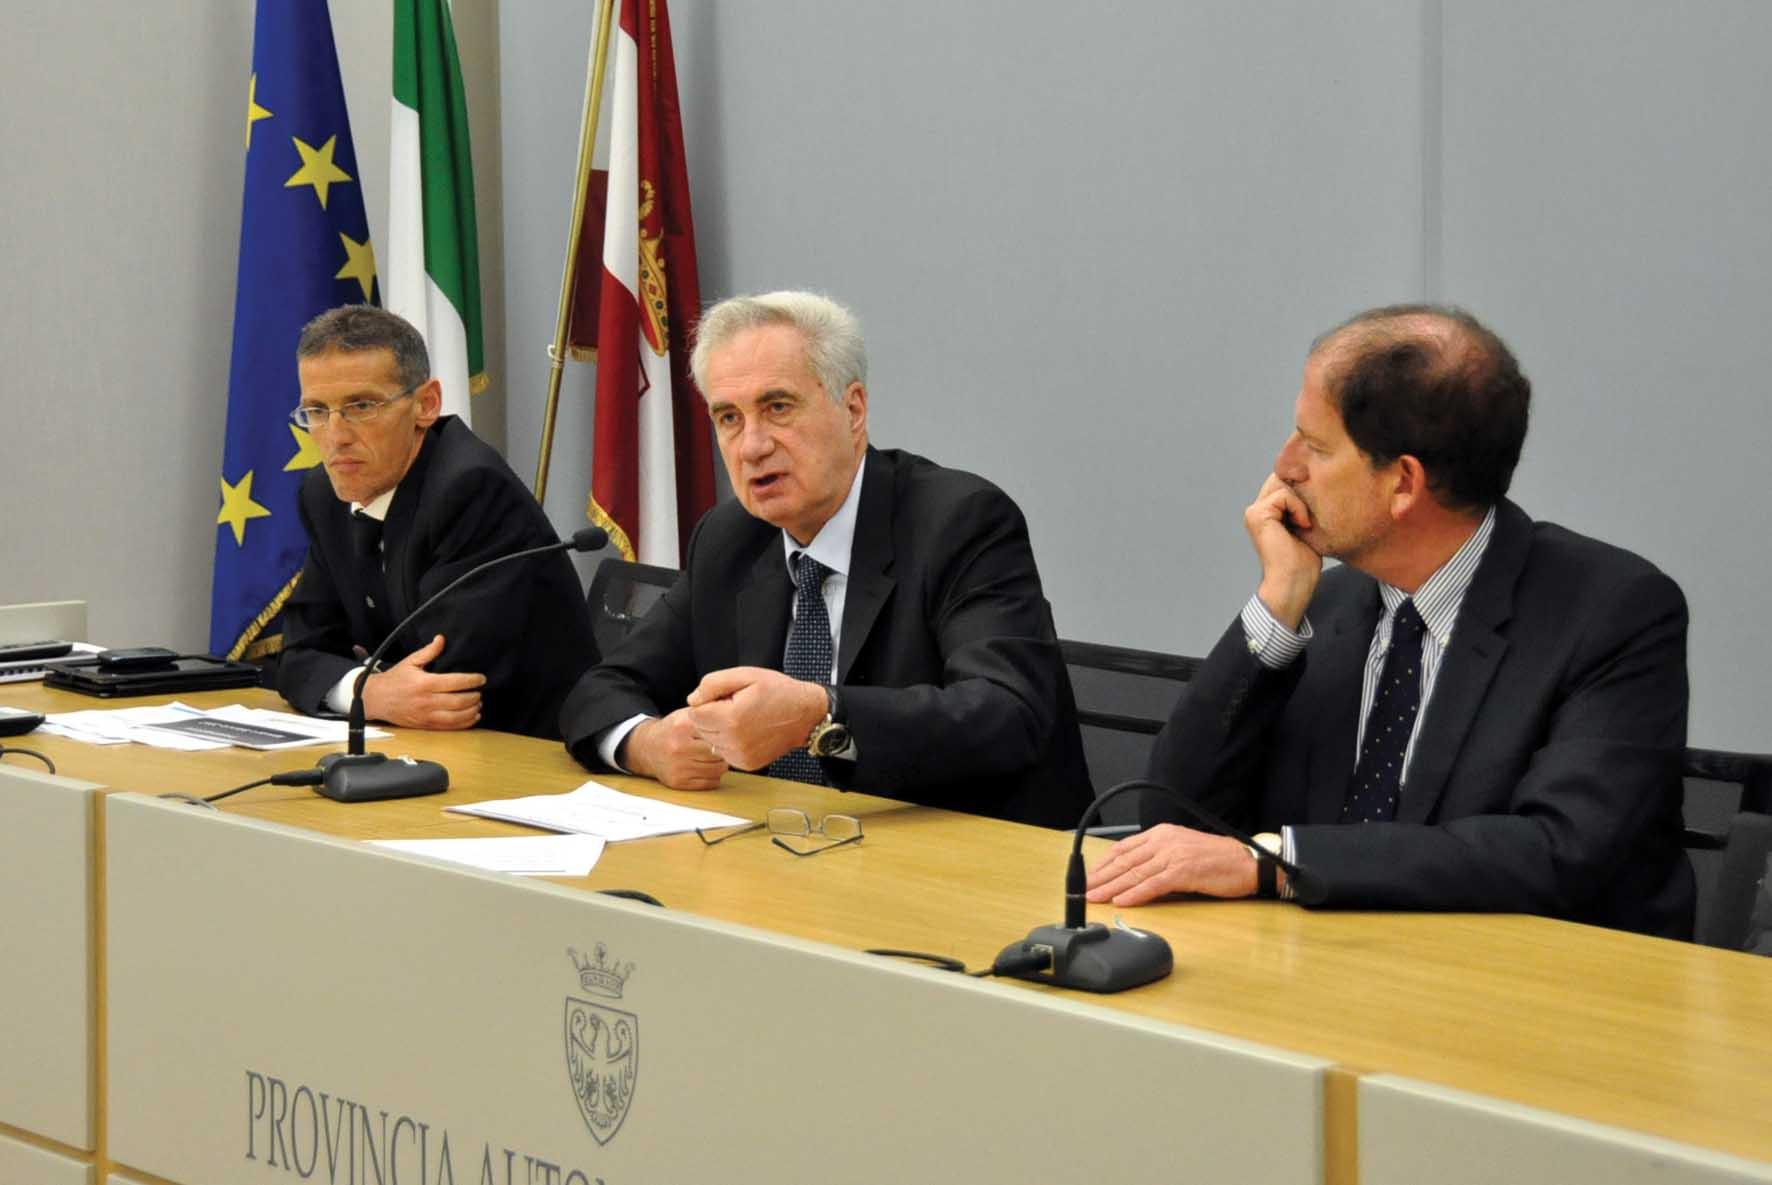 PAT cassa del trentino dir lorenzo bertoli pres gianfranco cerea alberto pacher 1